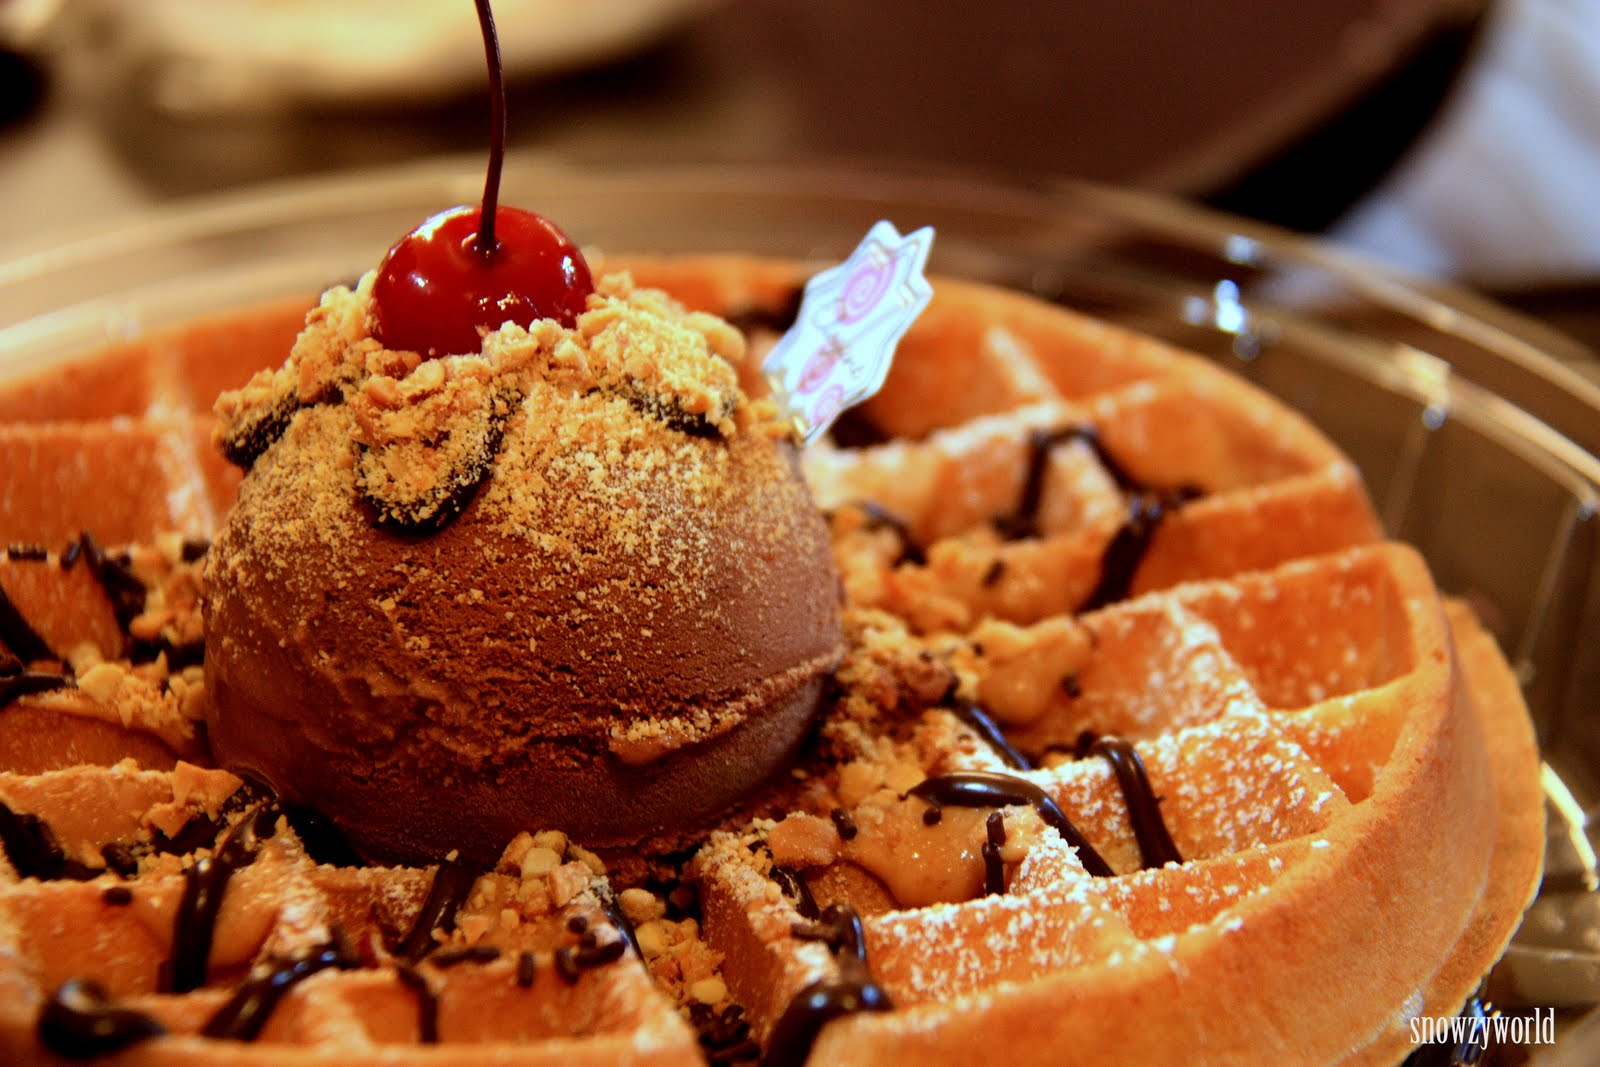 http://inkimprint.files.wordpress.com/2013/05/waffles-with-ice-cream.jpg